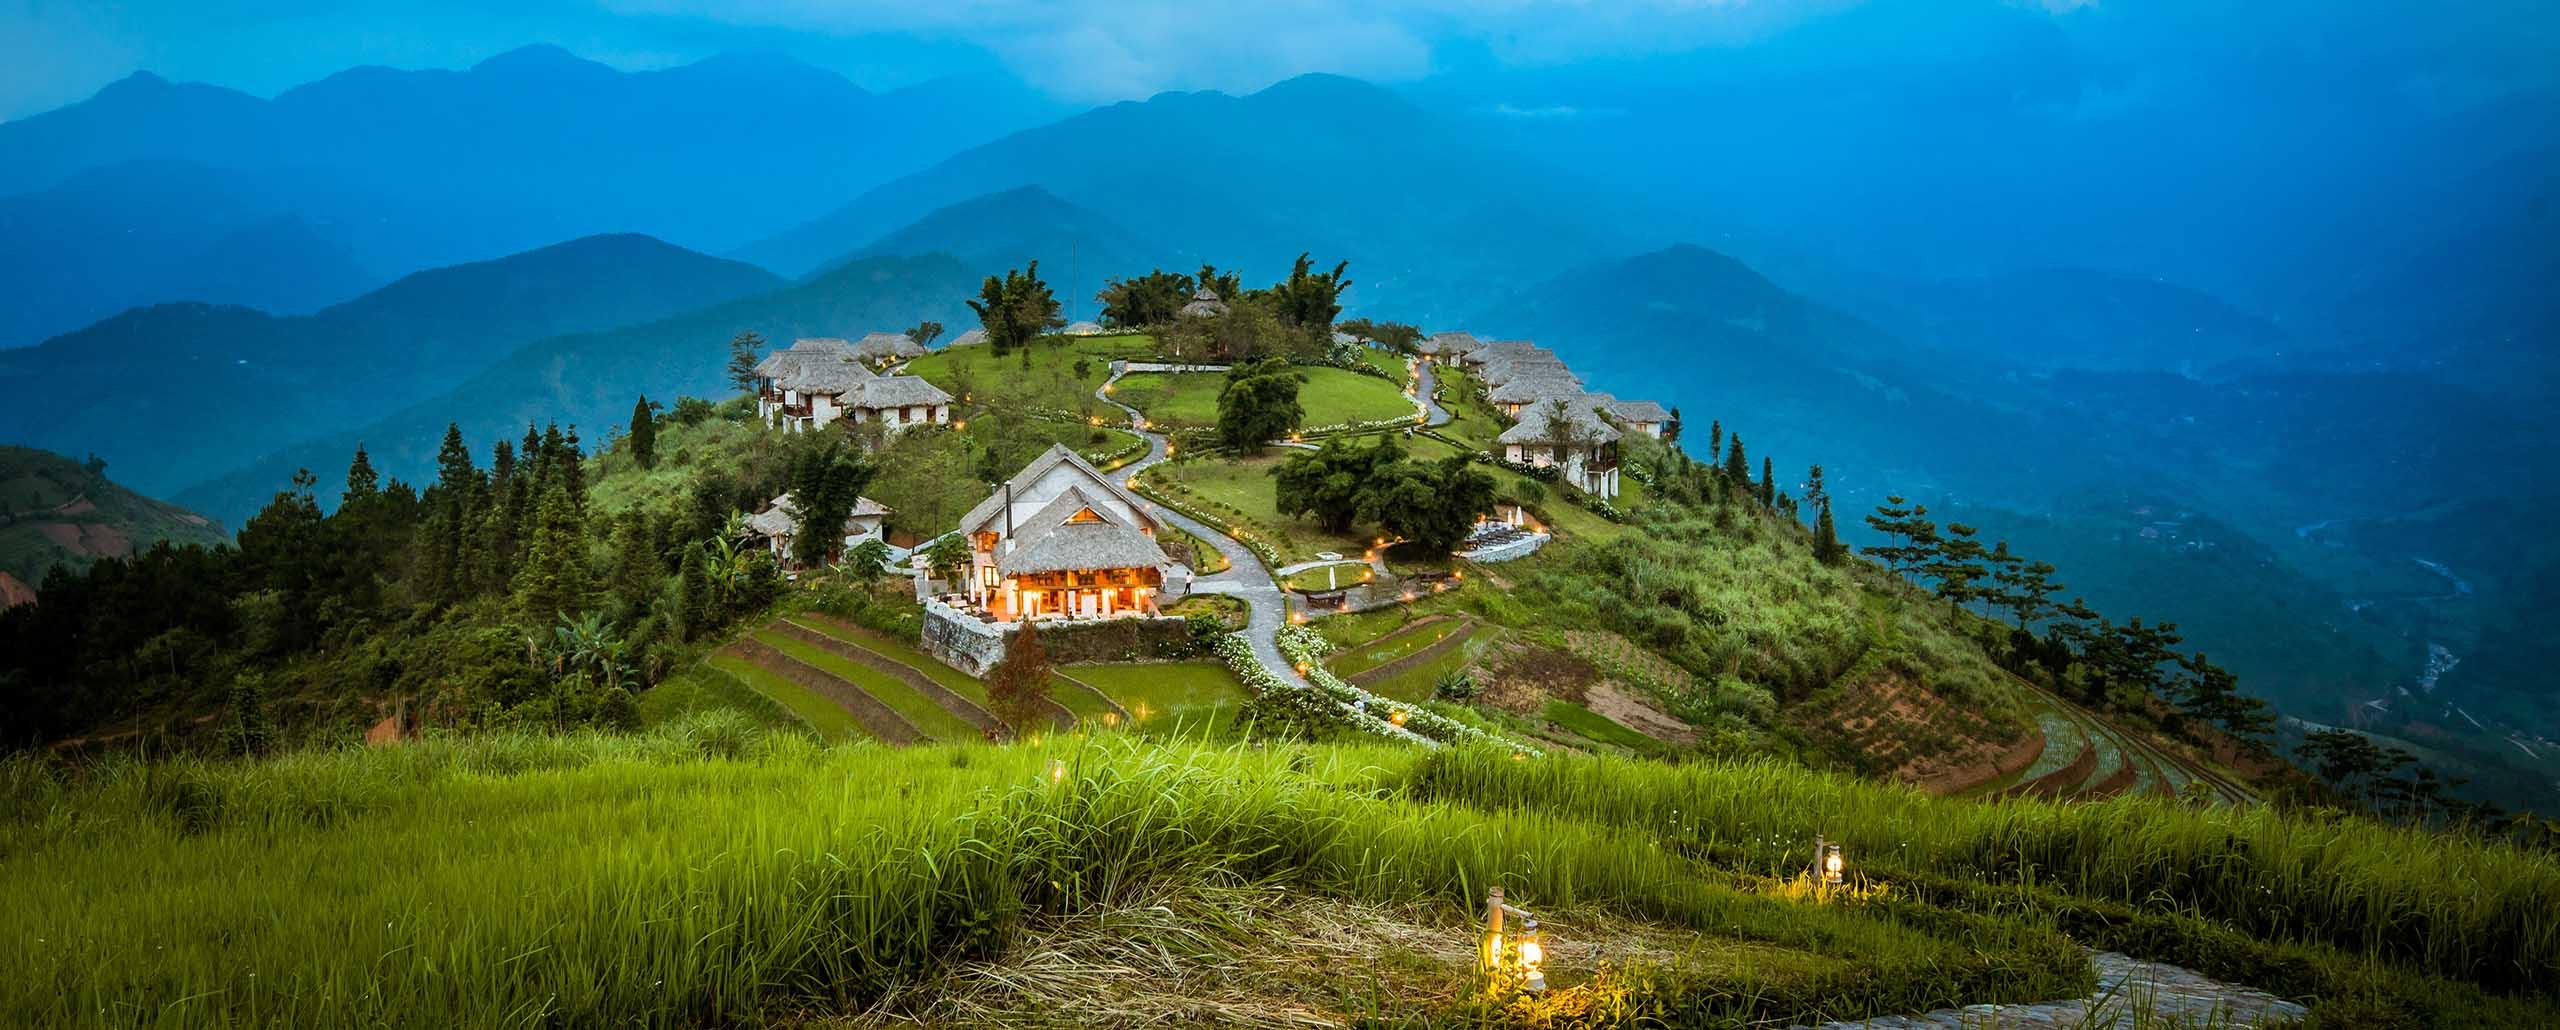 Topas_Eco-lodge,_Vietnam.jpg